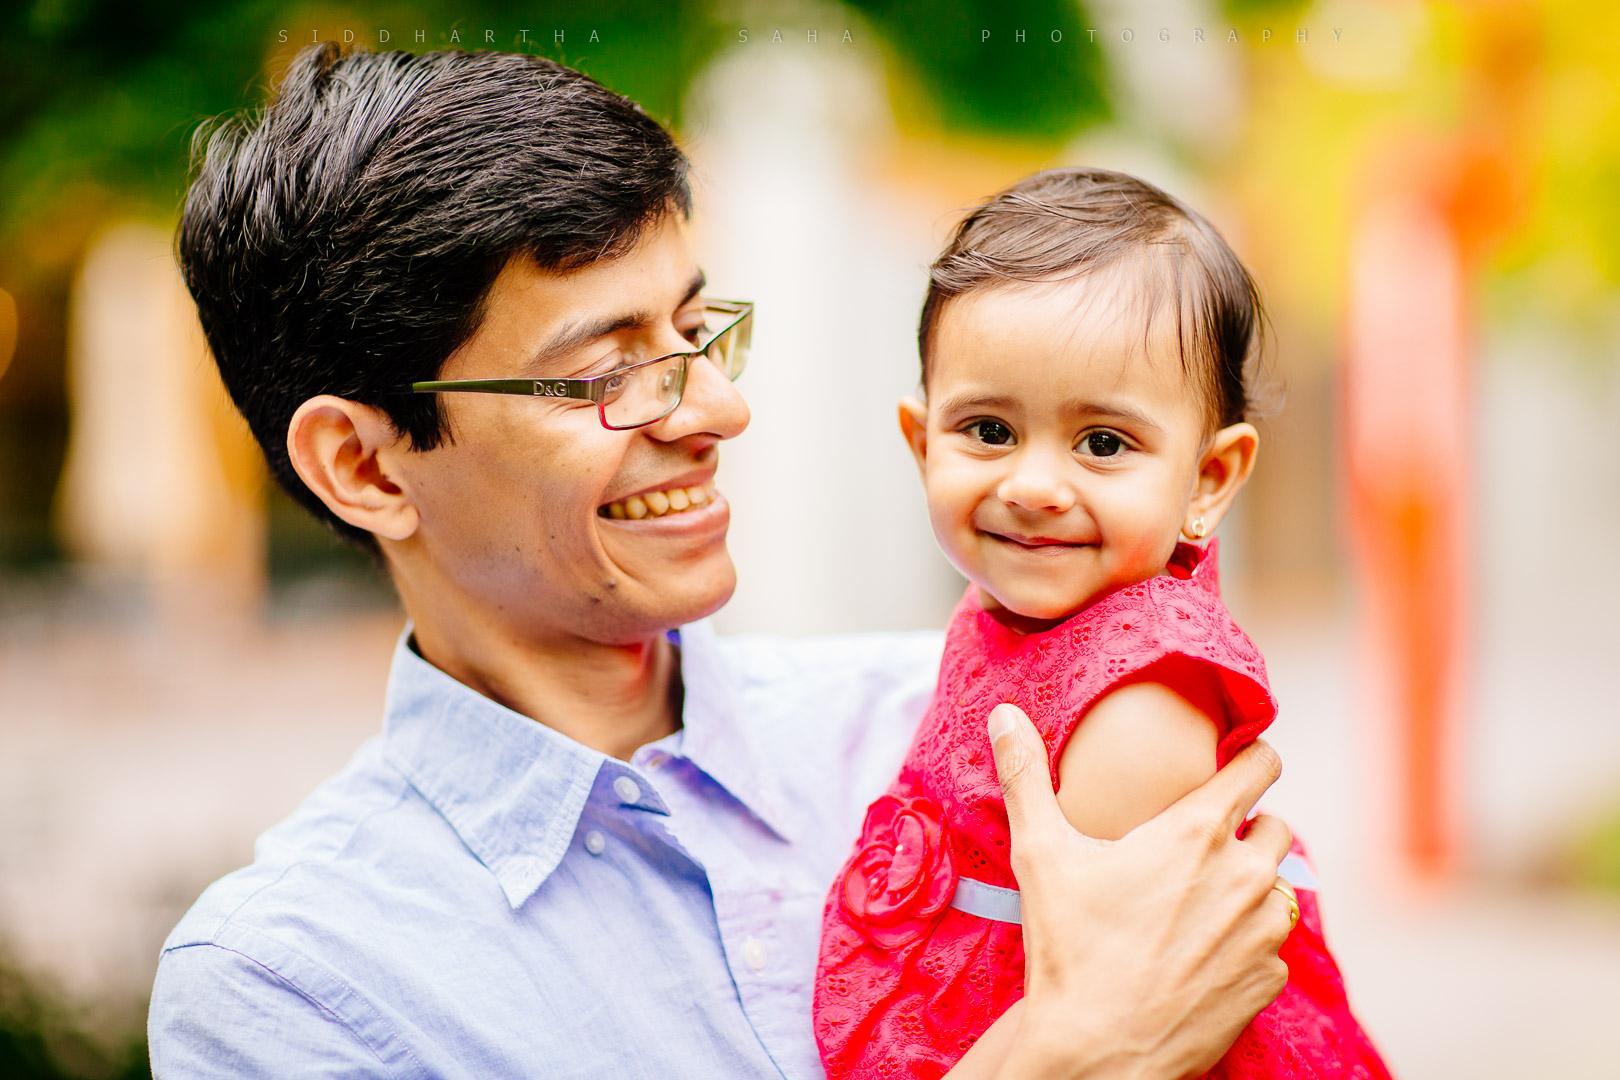 2015-08-08 - Padmaja Ketan Family Photoshoot - _05Y8991